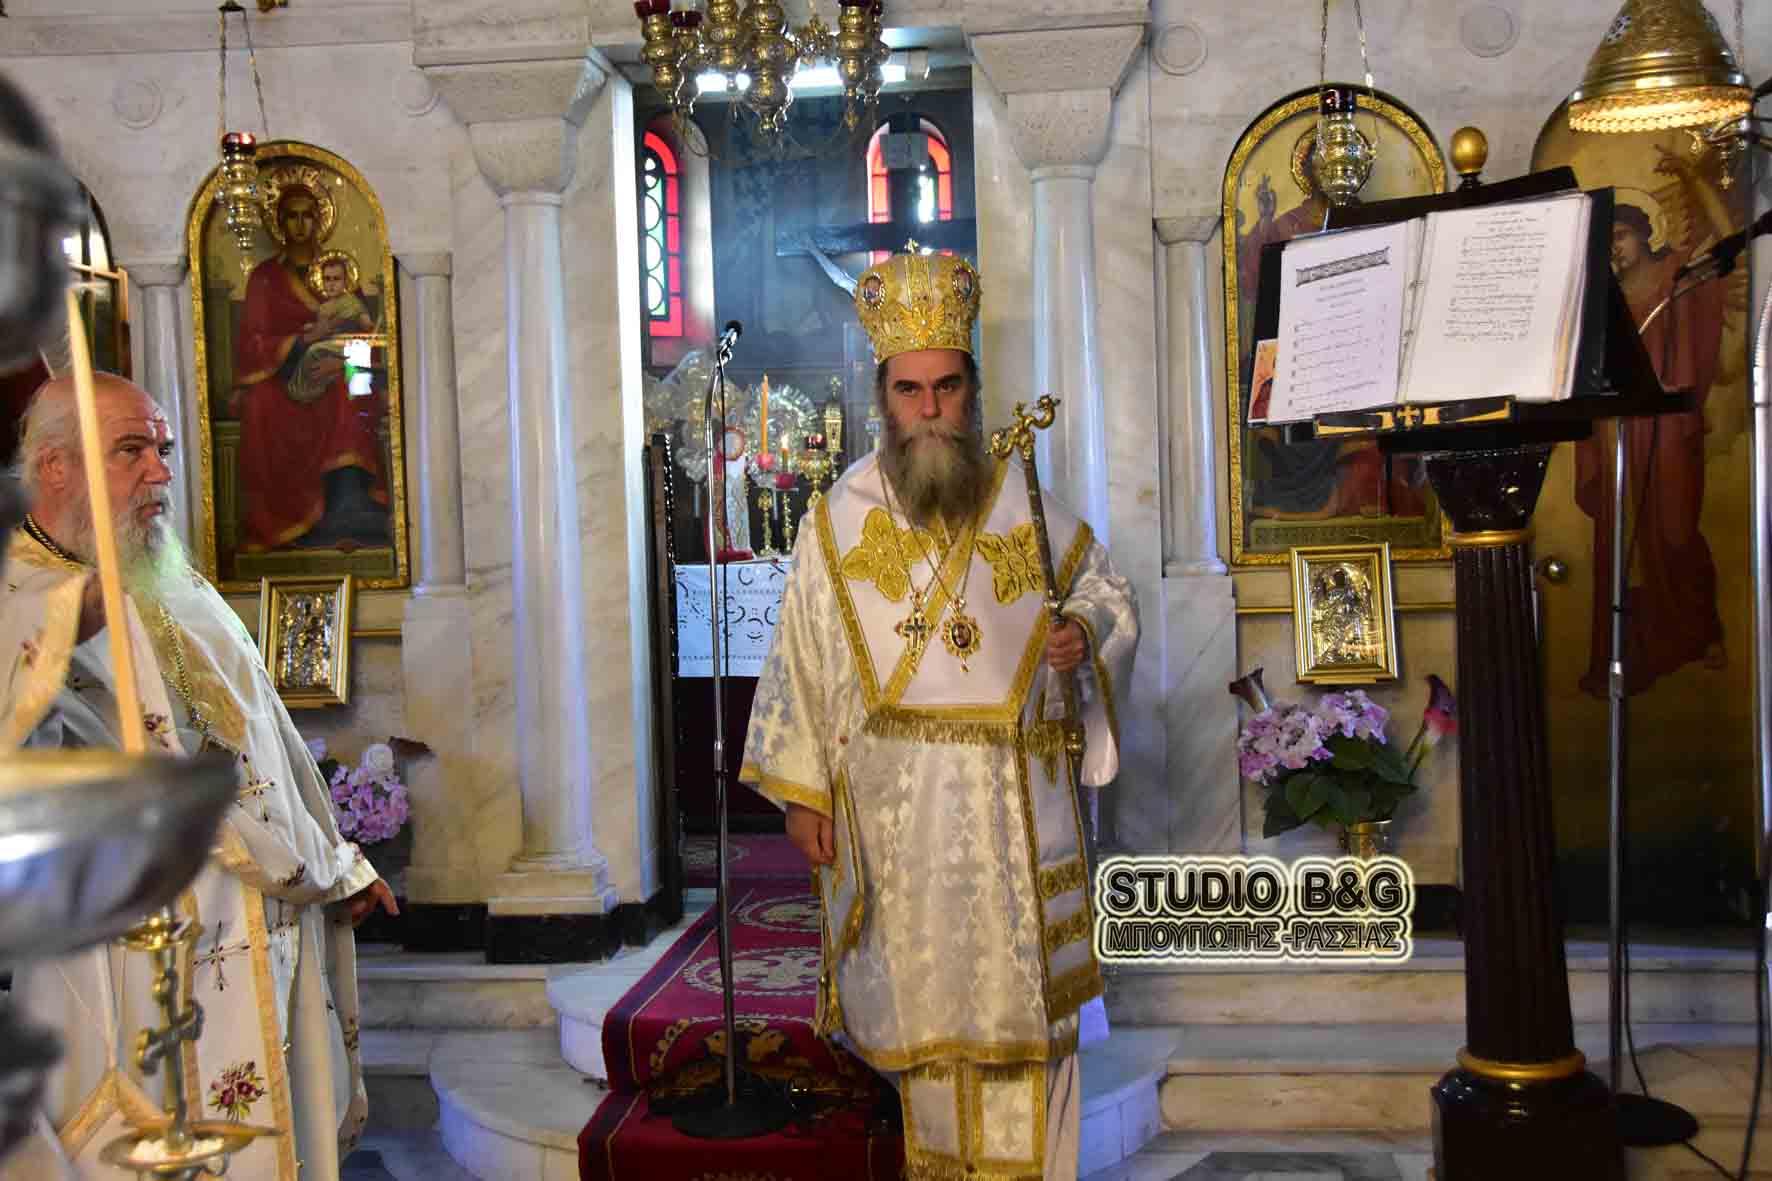 You are currently viewing Αρχιερατική Θεία Λειτουργία και επιμνημόσυνη δέηση για τα θύματα της Μικρασιάτικης καταστροφής στην Νέα Κίο